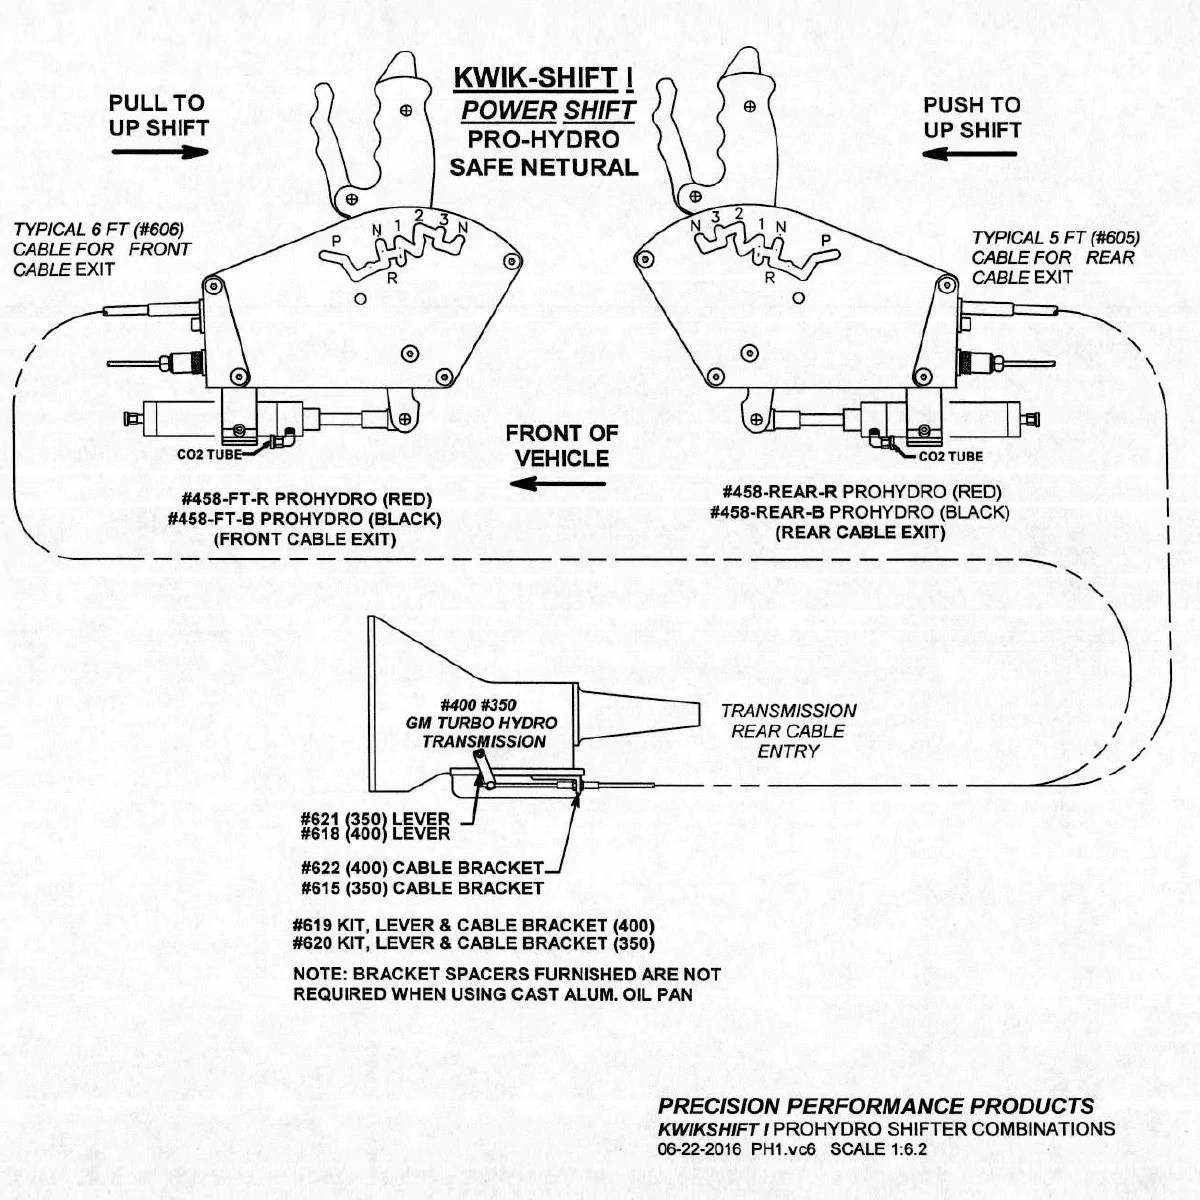 medium resolution of turbo 400 transmission wiring diagram wiring diagram todays turbo 400 transmission diagram 85 chevy 400 transmission